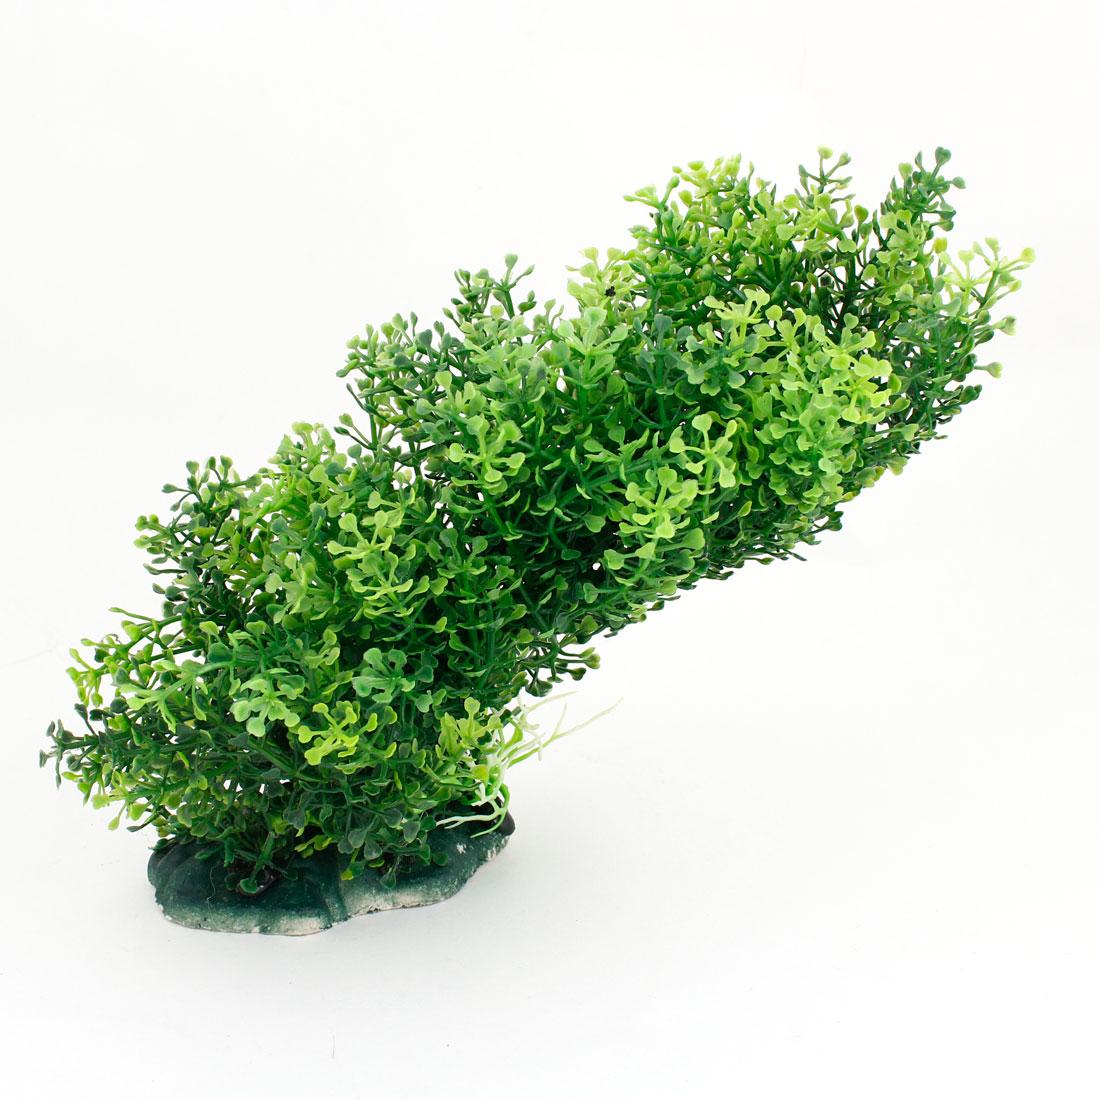 "7.1"" High Green Artificial Manmade Aquarium Decoration Grass Plants"